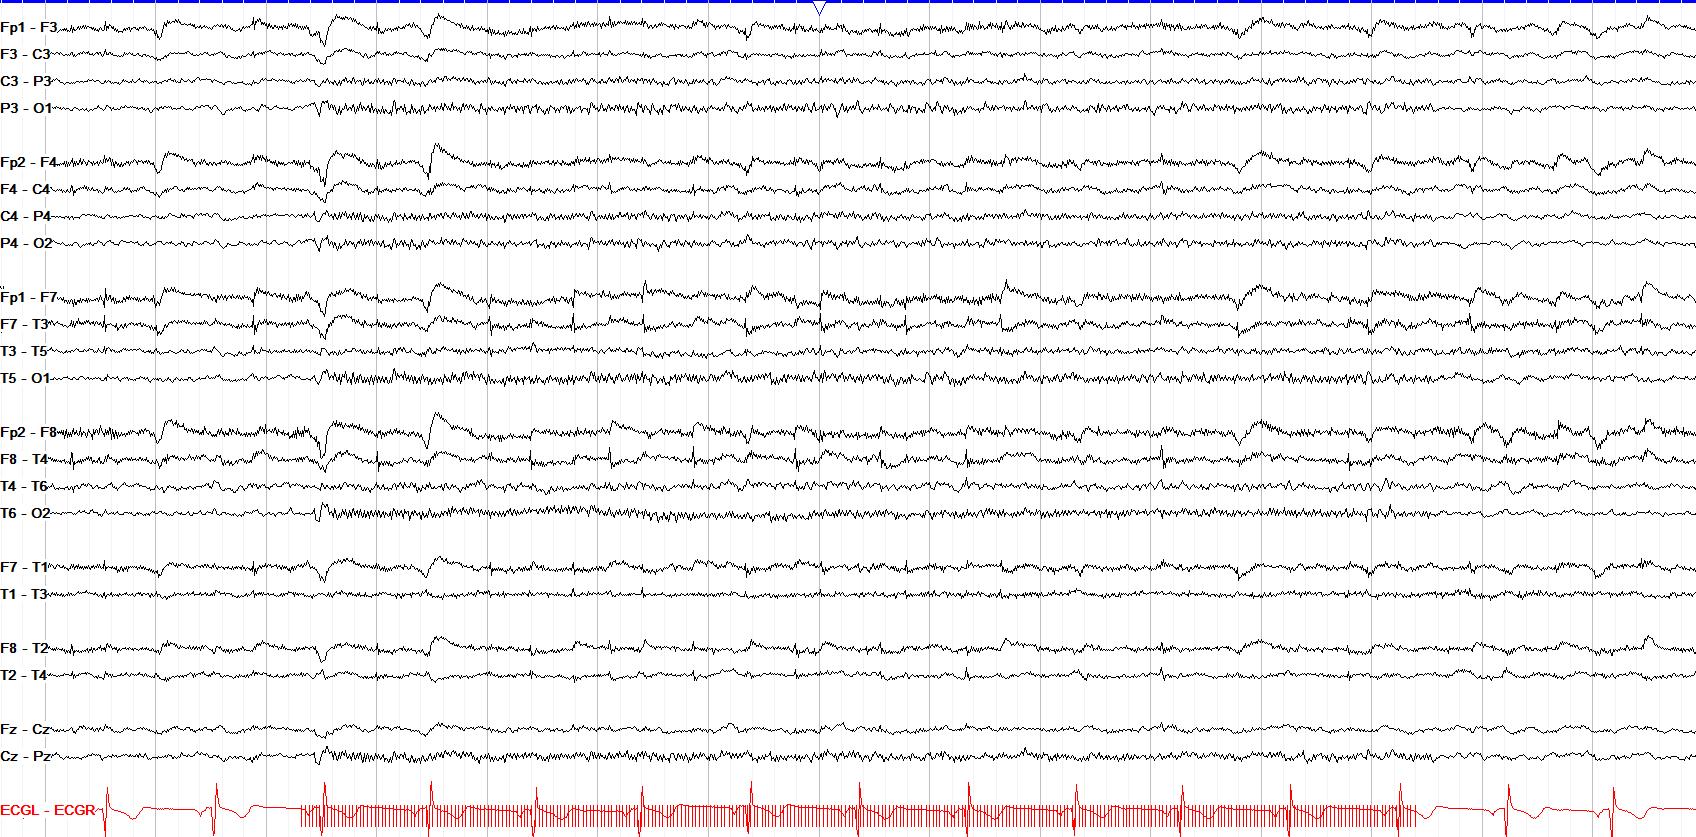 photic driving 30 Hz